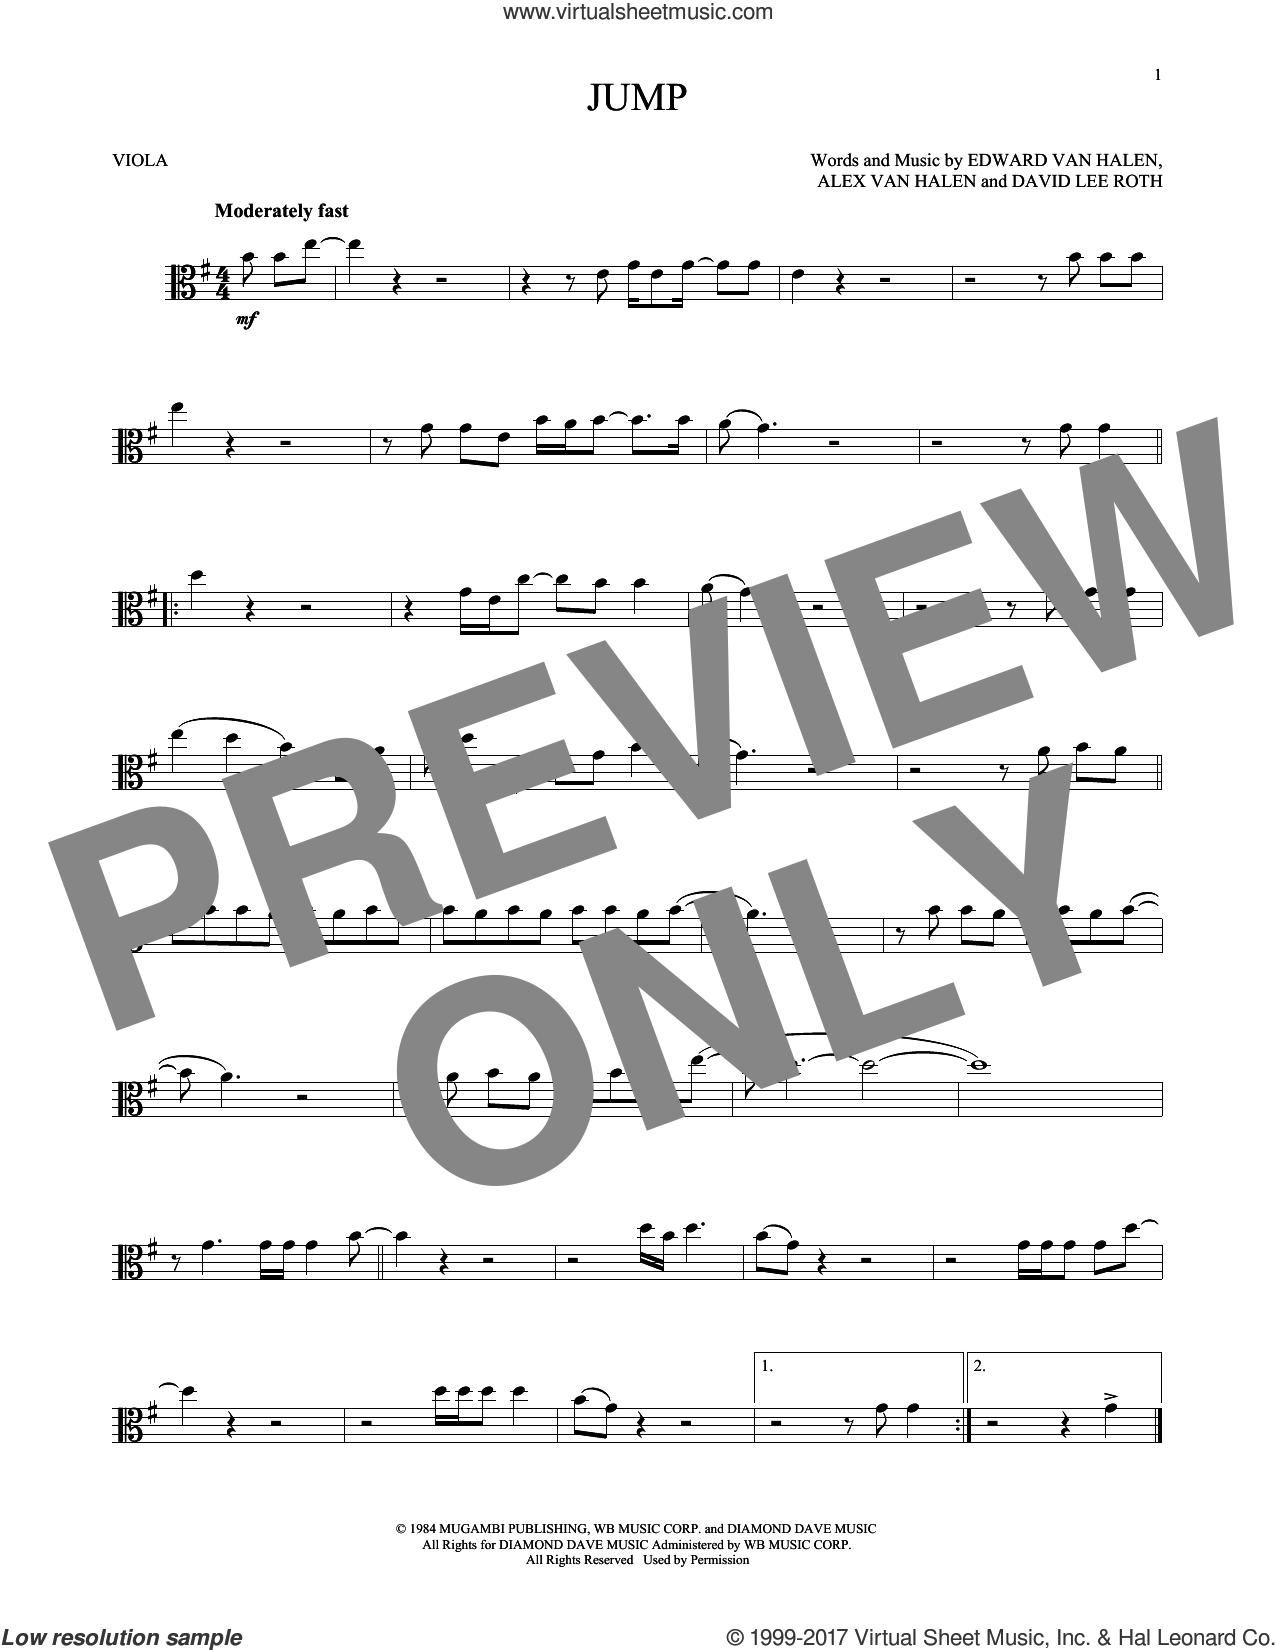 Jump sheet music for viola solo by Edward Van Halen, Alex Van Halen and David Lee Roth, intermediate skill level